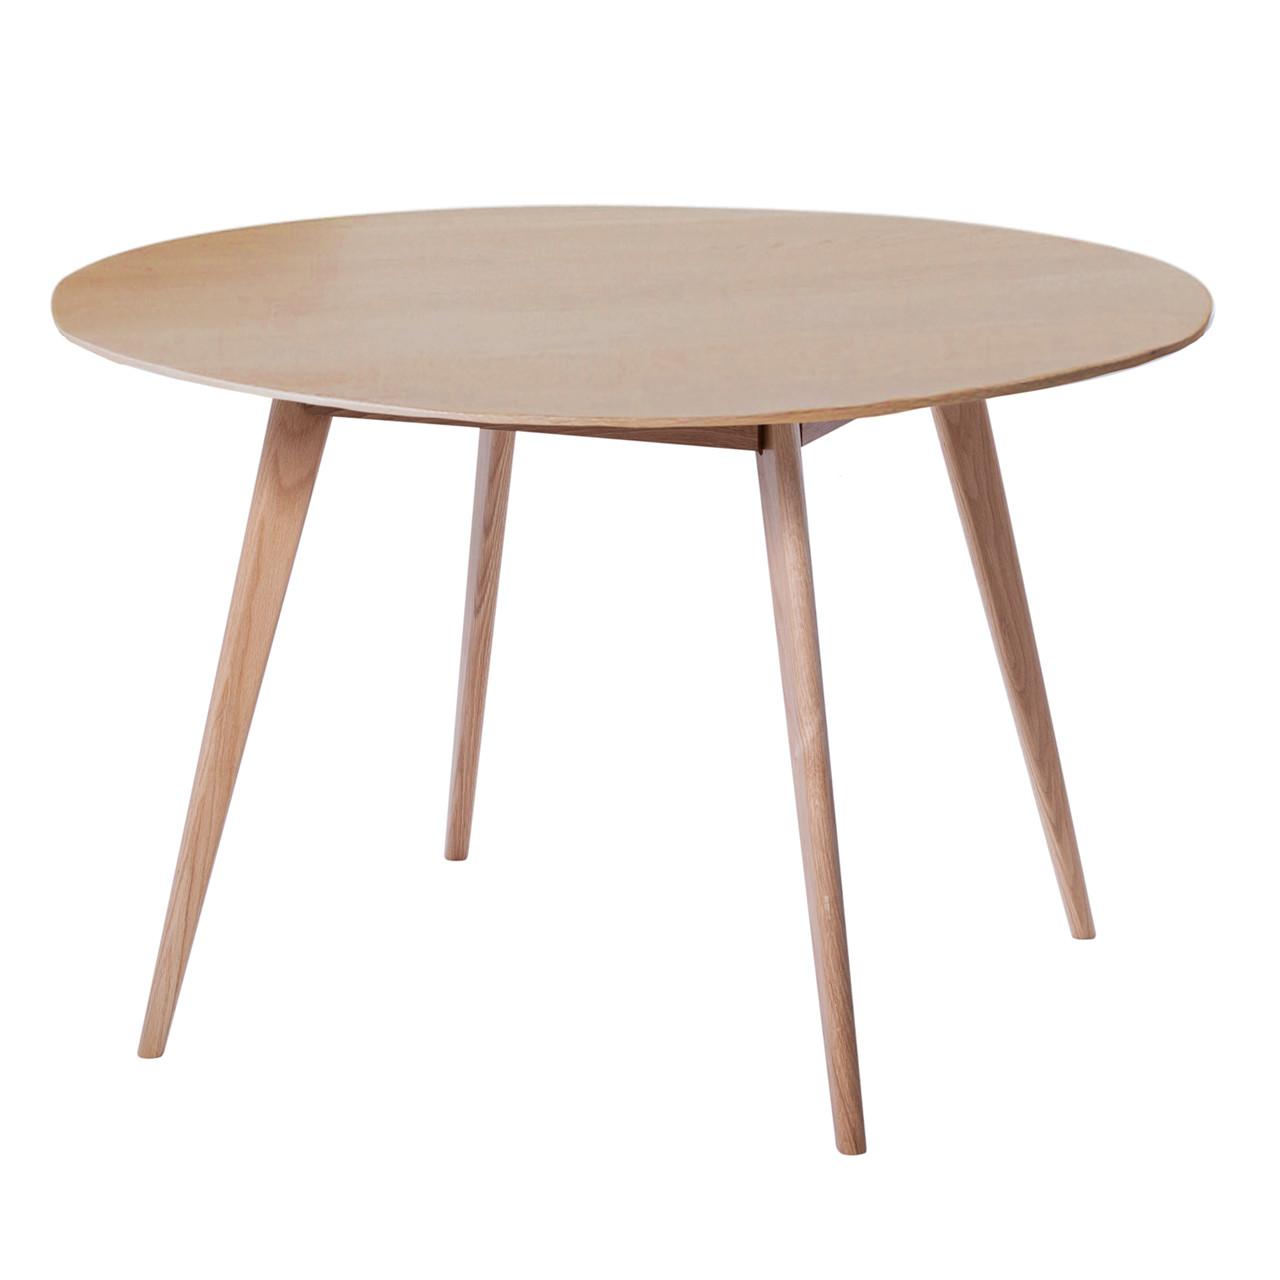 Bloom spisebord Ø 120 cm